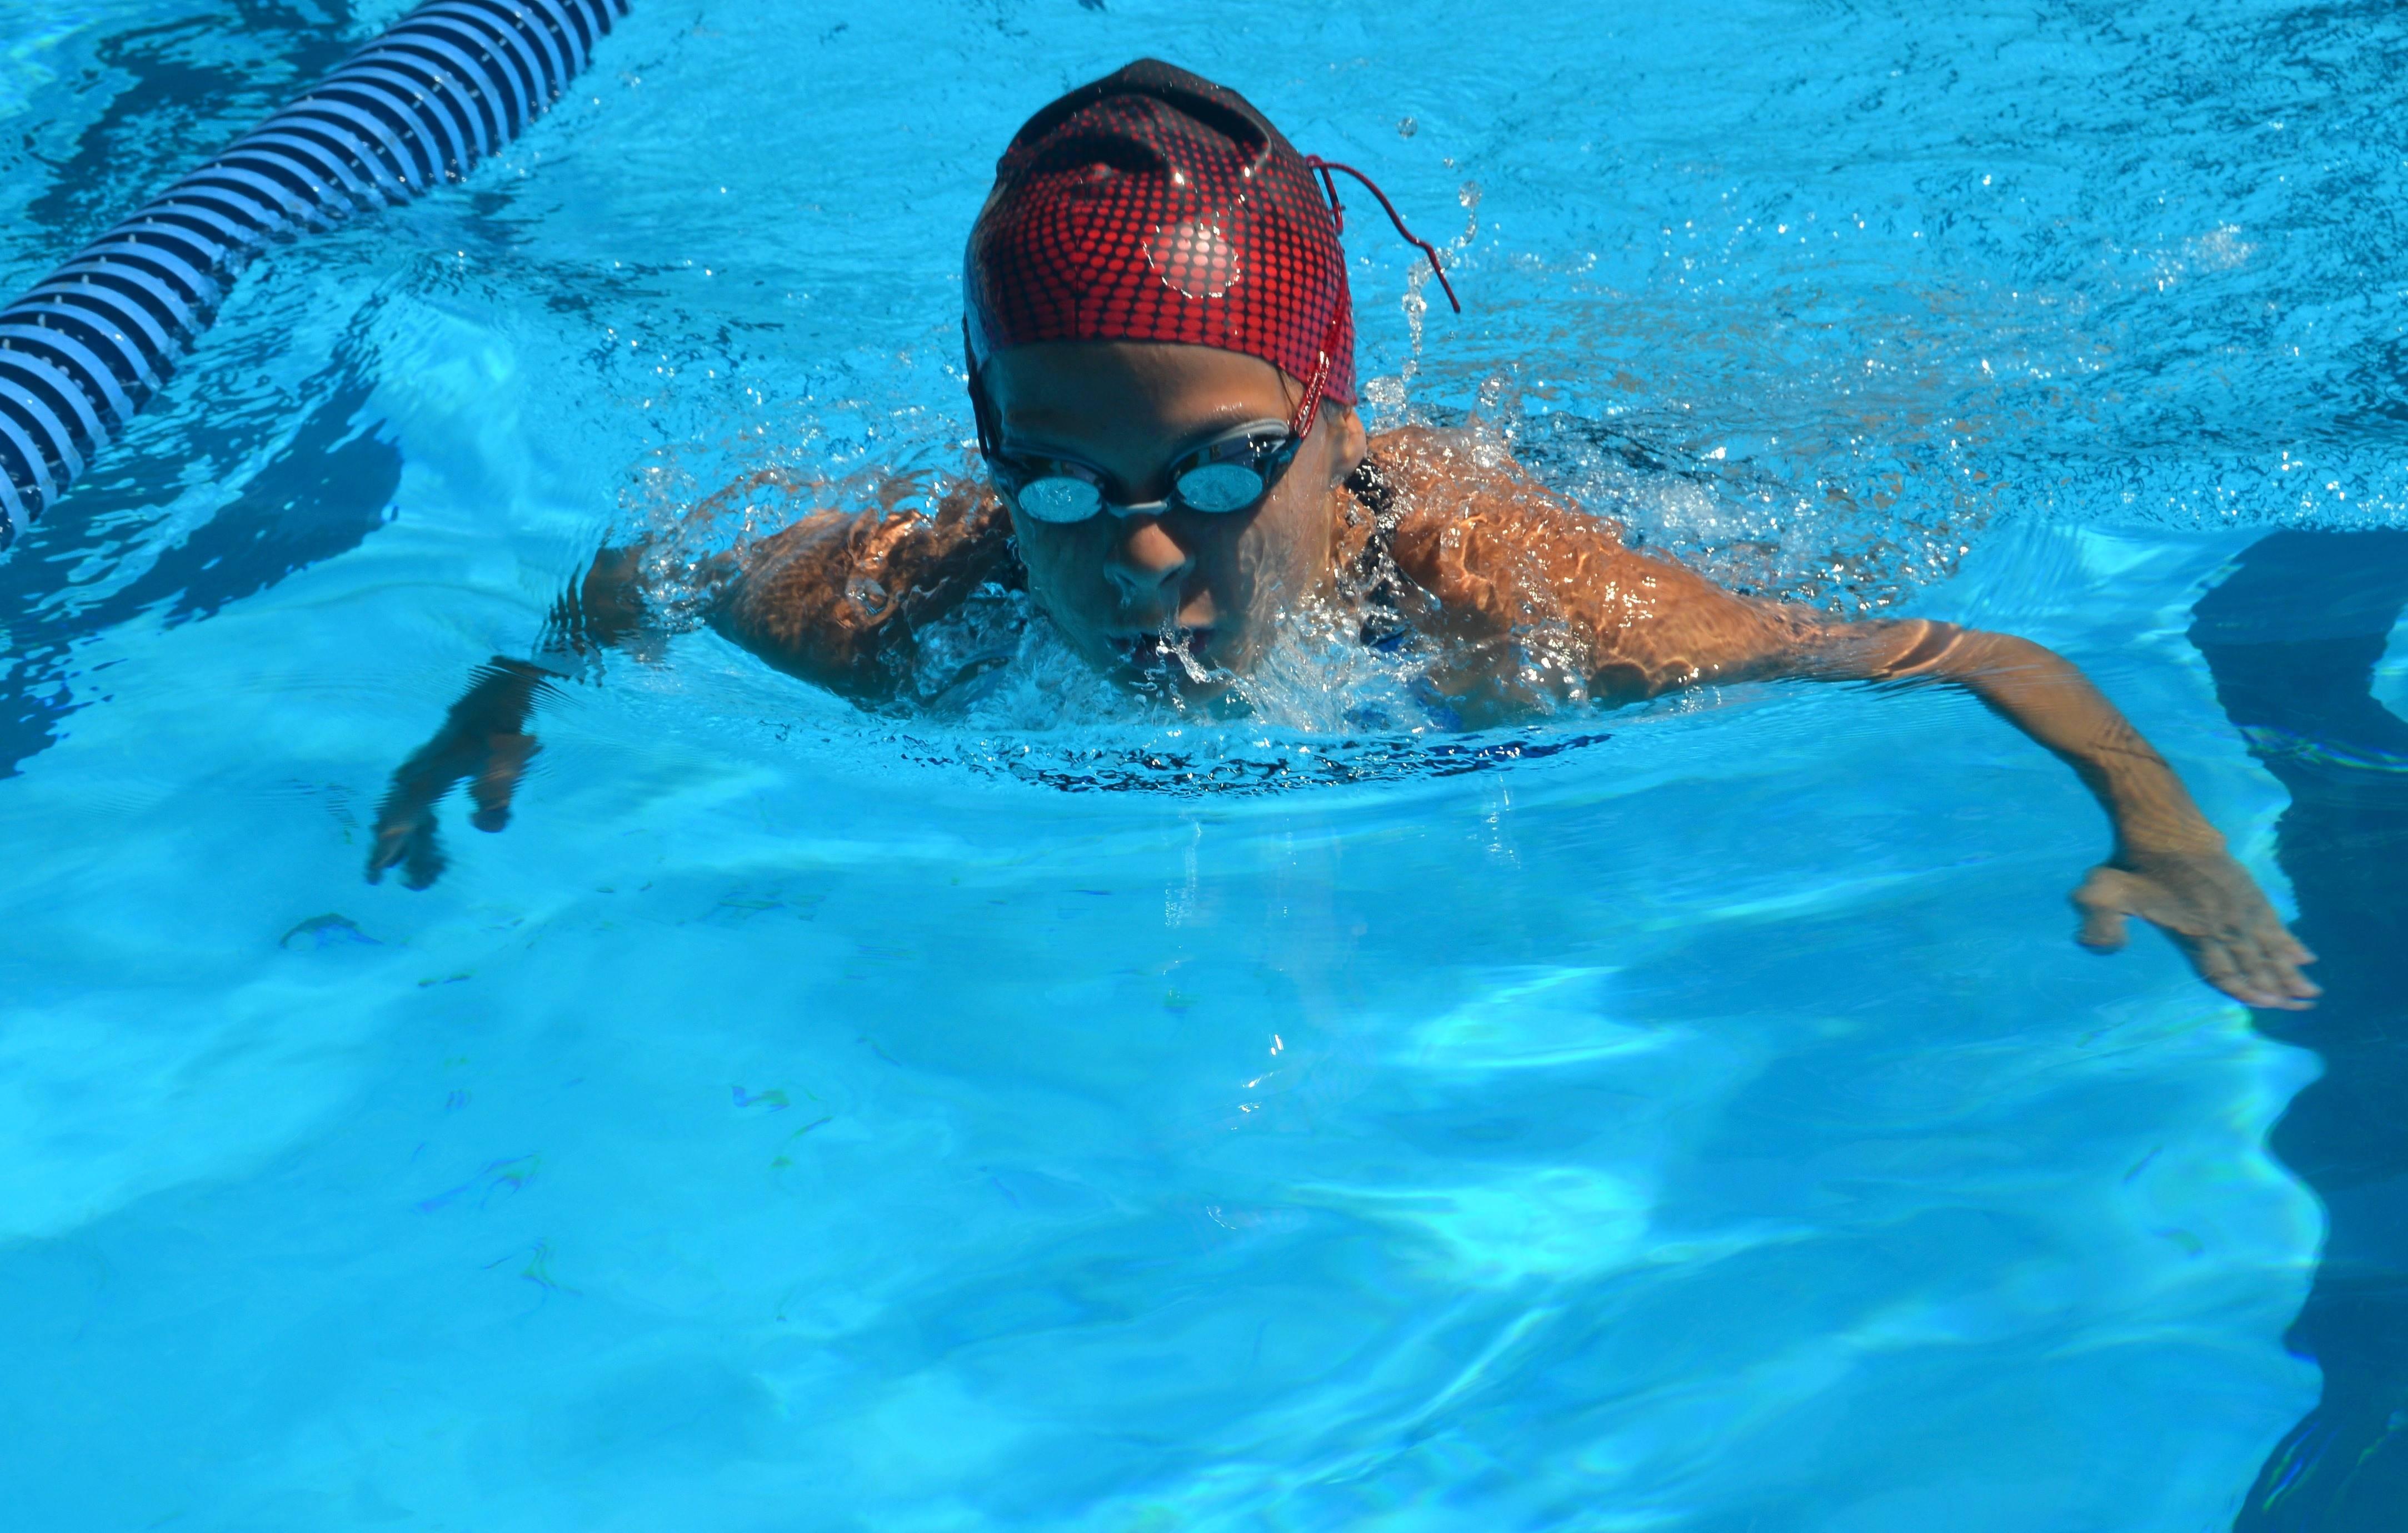 d0a959fe45262ec34311_Swim-a-palooza_girl.JPG